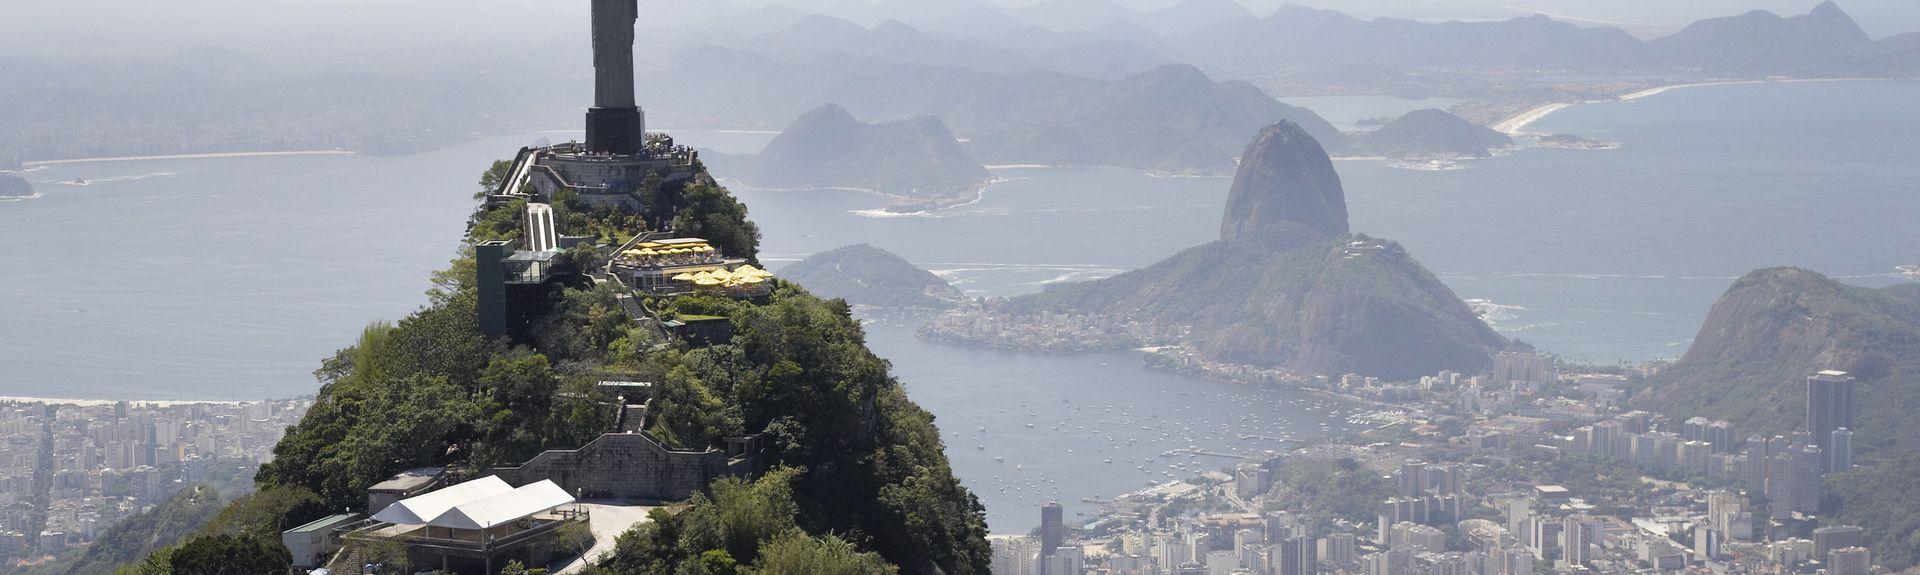 Rio de Janeiro, Regio zuidoost, Brazilië